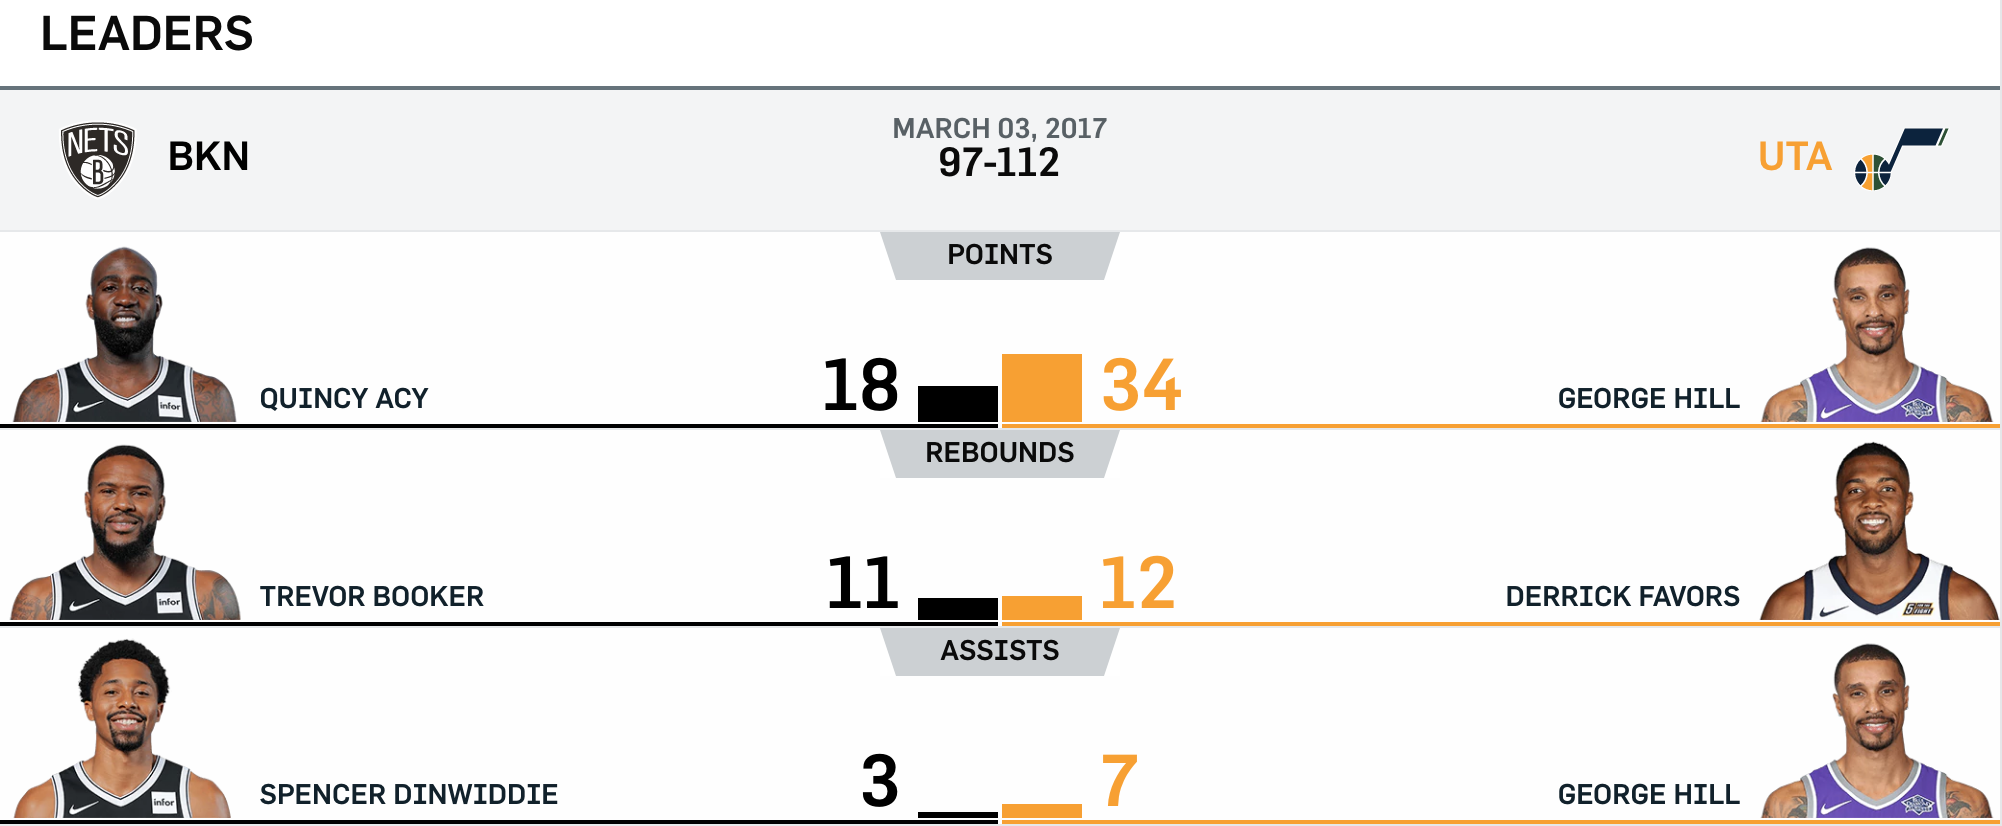 Nets vs Jazz 3-3-17 Leaders